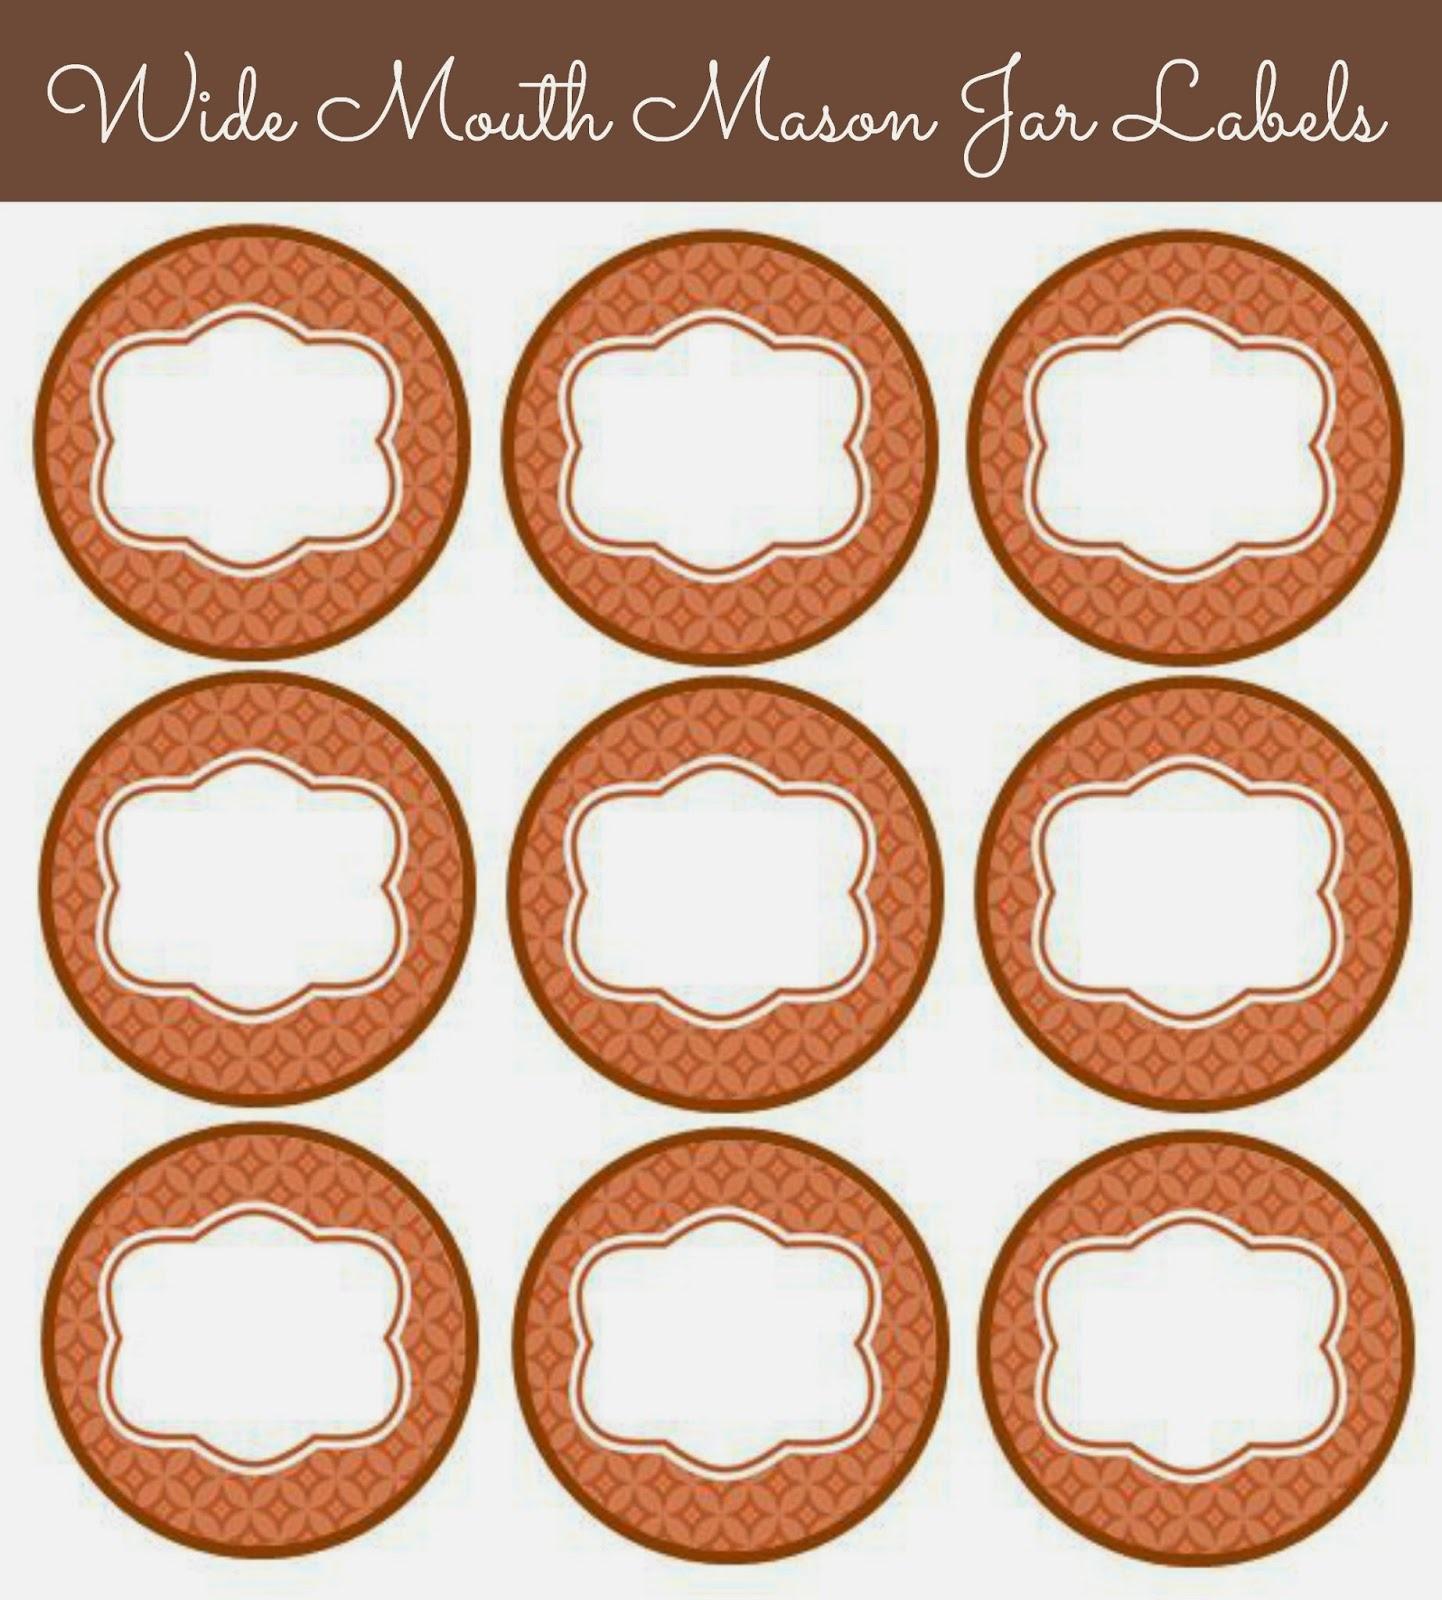 56 Cute Mason Jar Labels | Kittybabylove - Free Printable Jar Label Templates